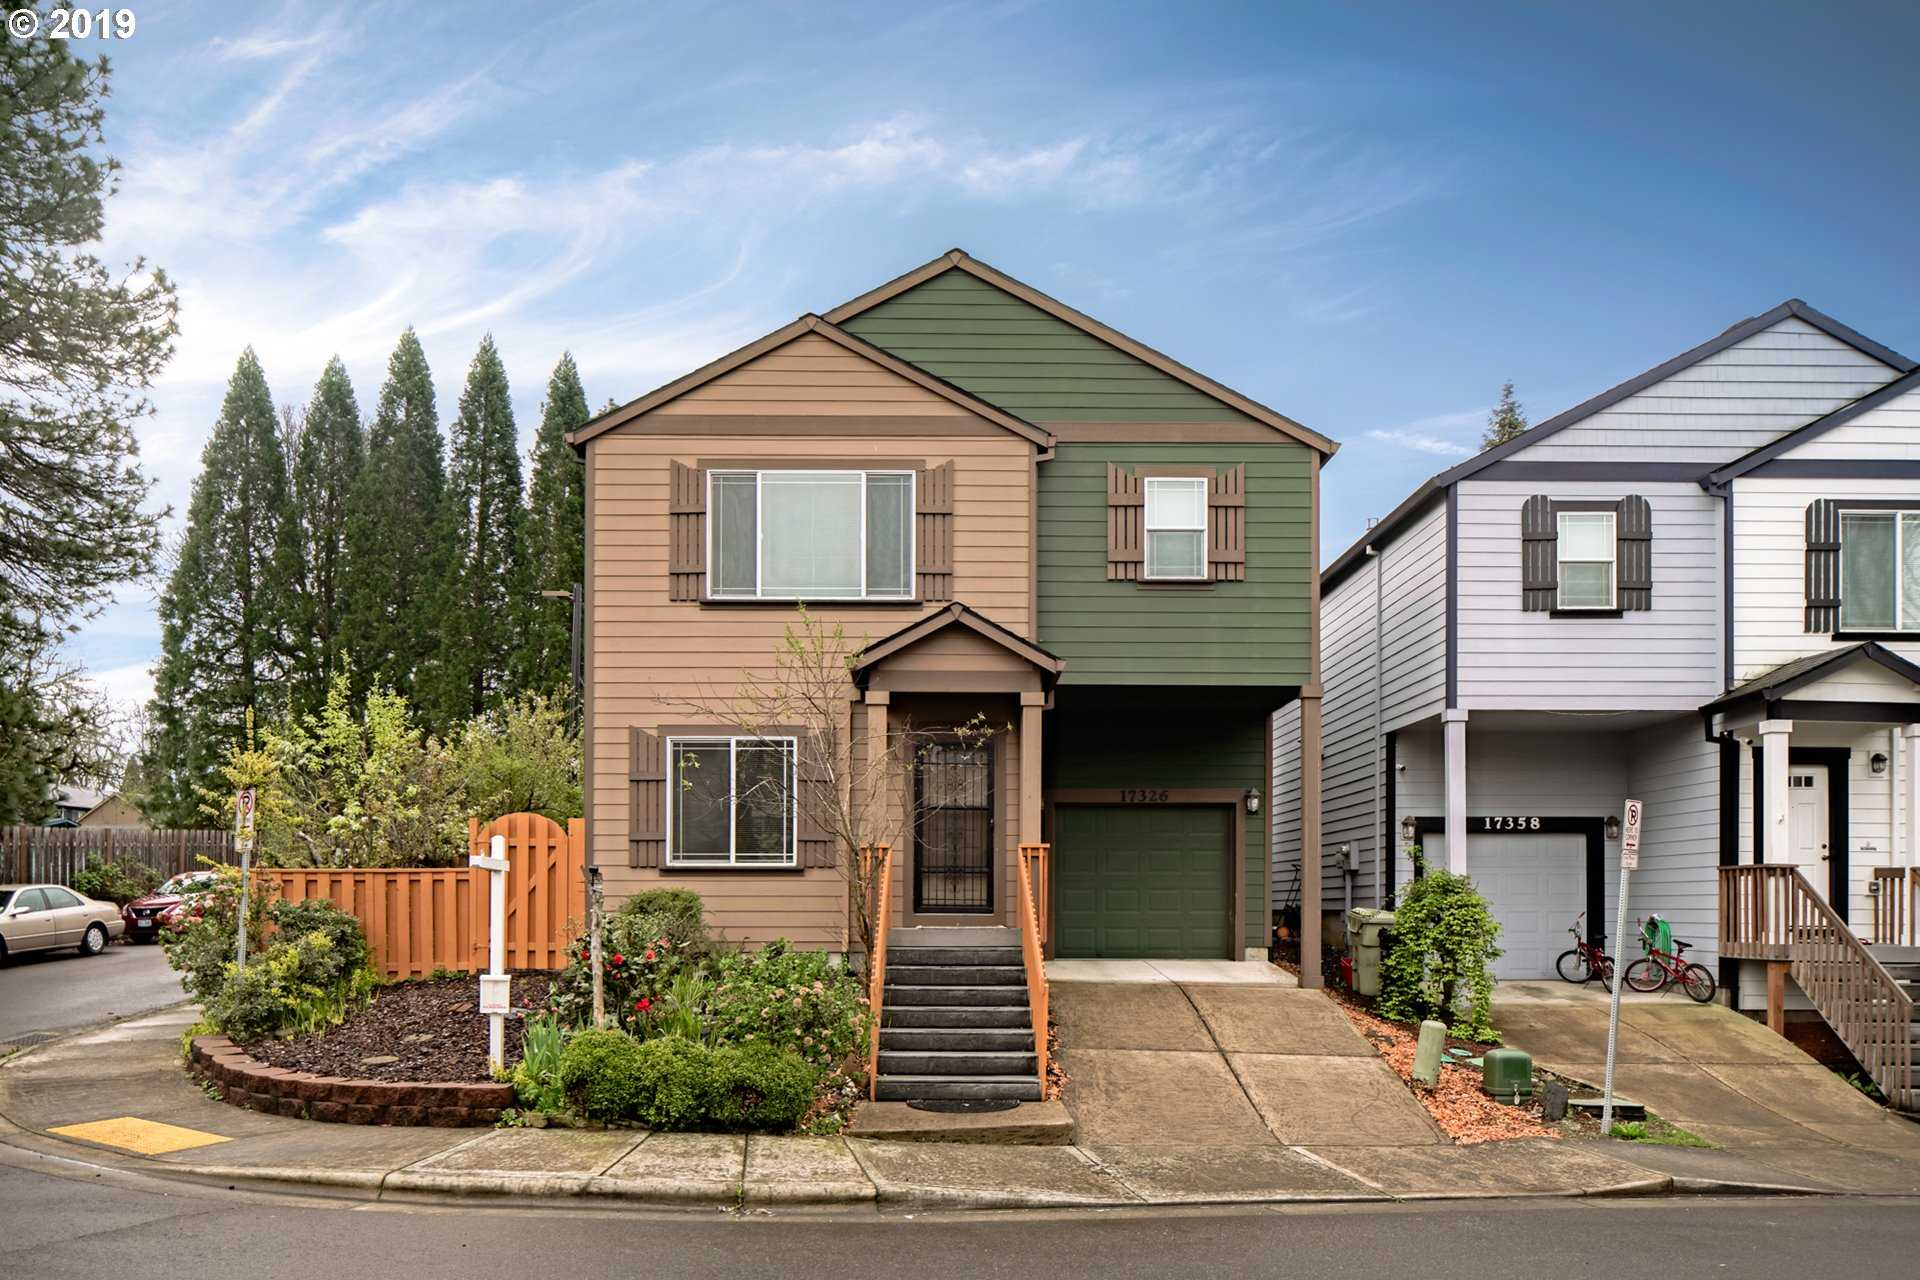 $344,900 - 3Br/3Ba -  for Sale in Beaverton